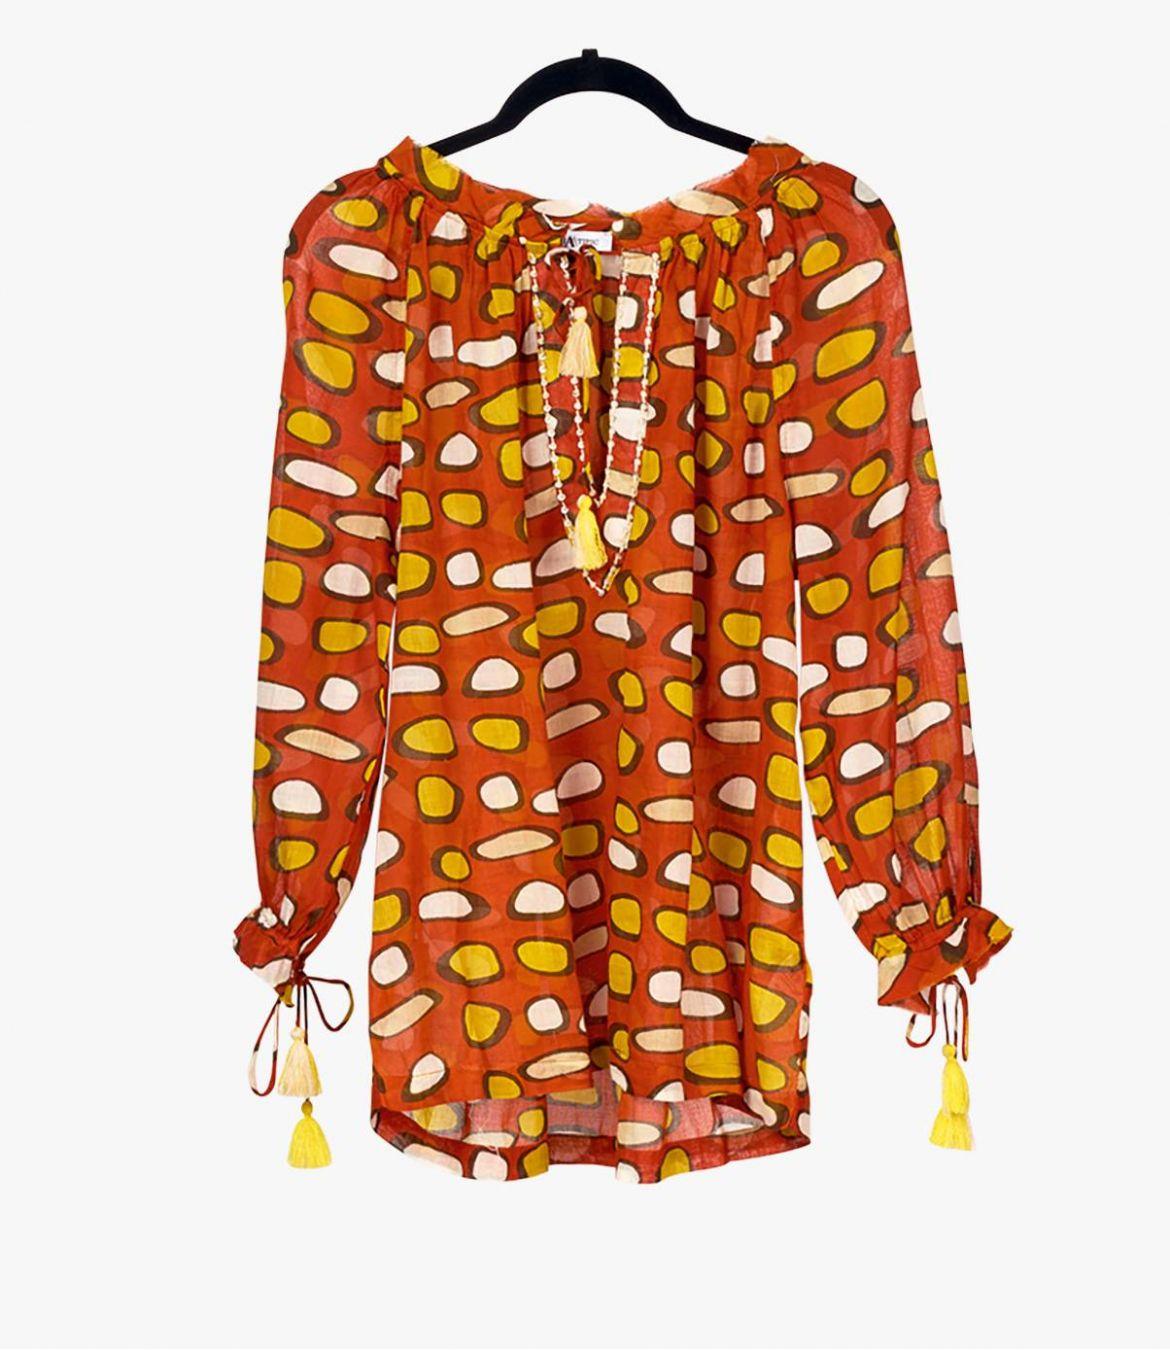 BETI GALET Cotton Blouse for Women Storiatipic - 2